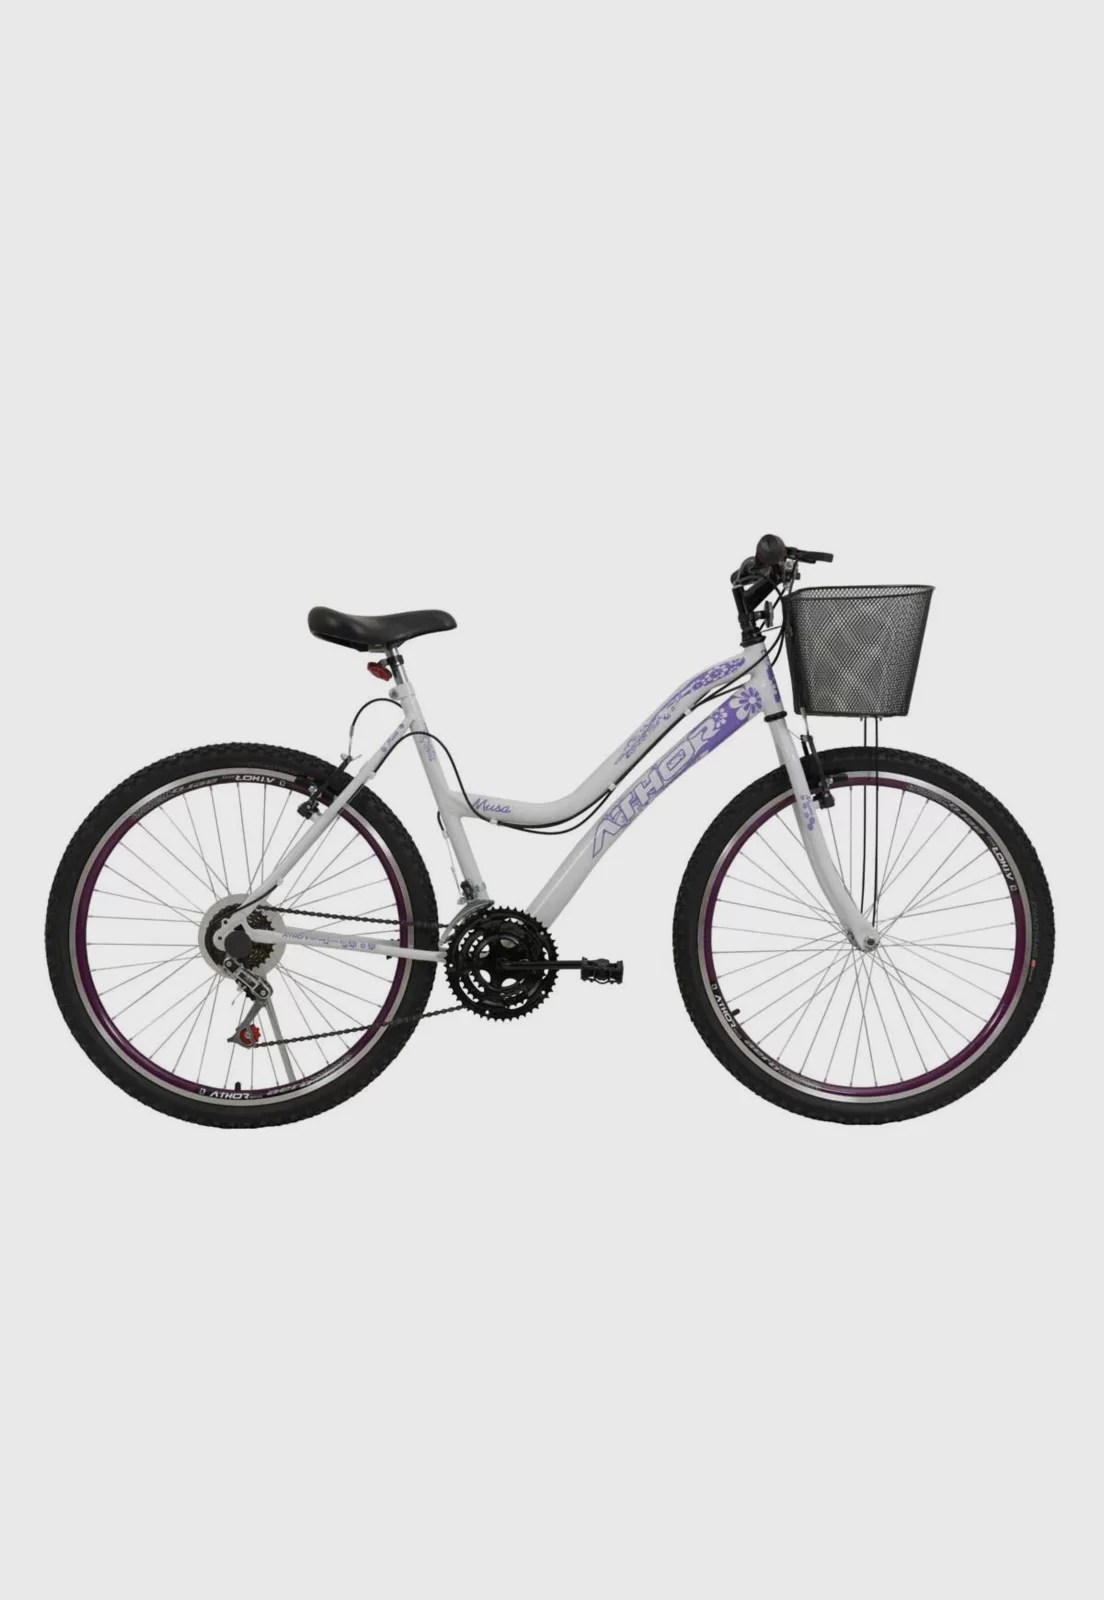 Bicicleta Athor Bike Musa Aro 26 Rígida 18 Marchas